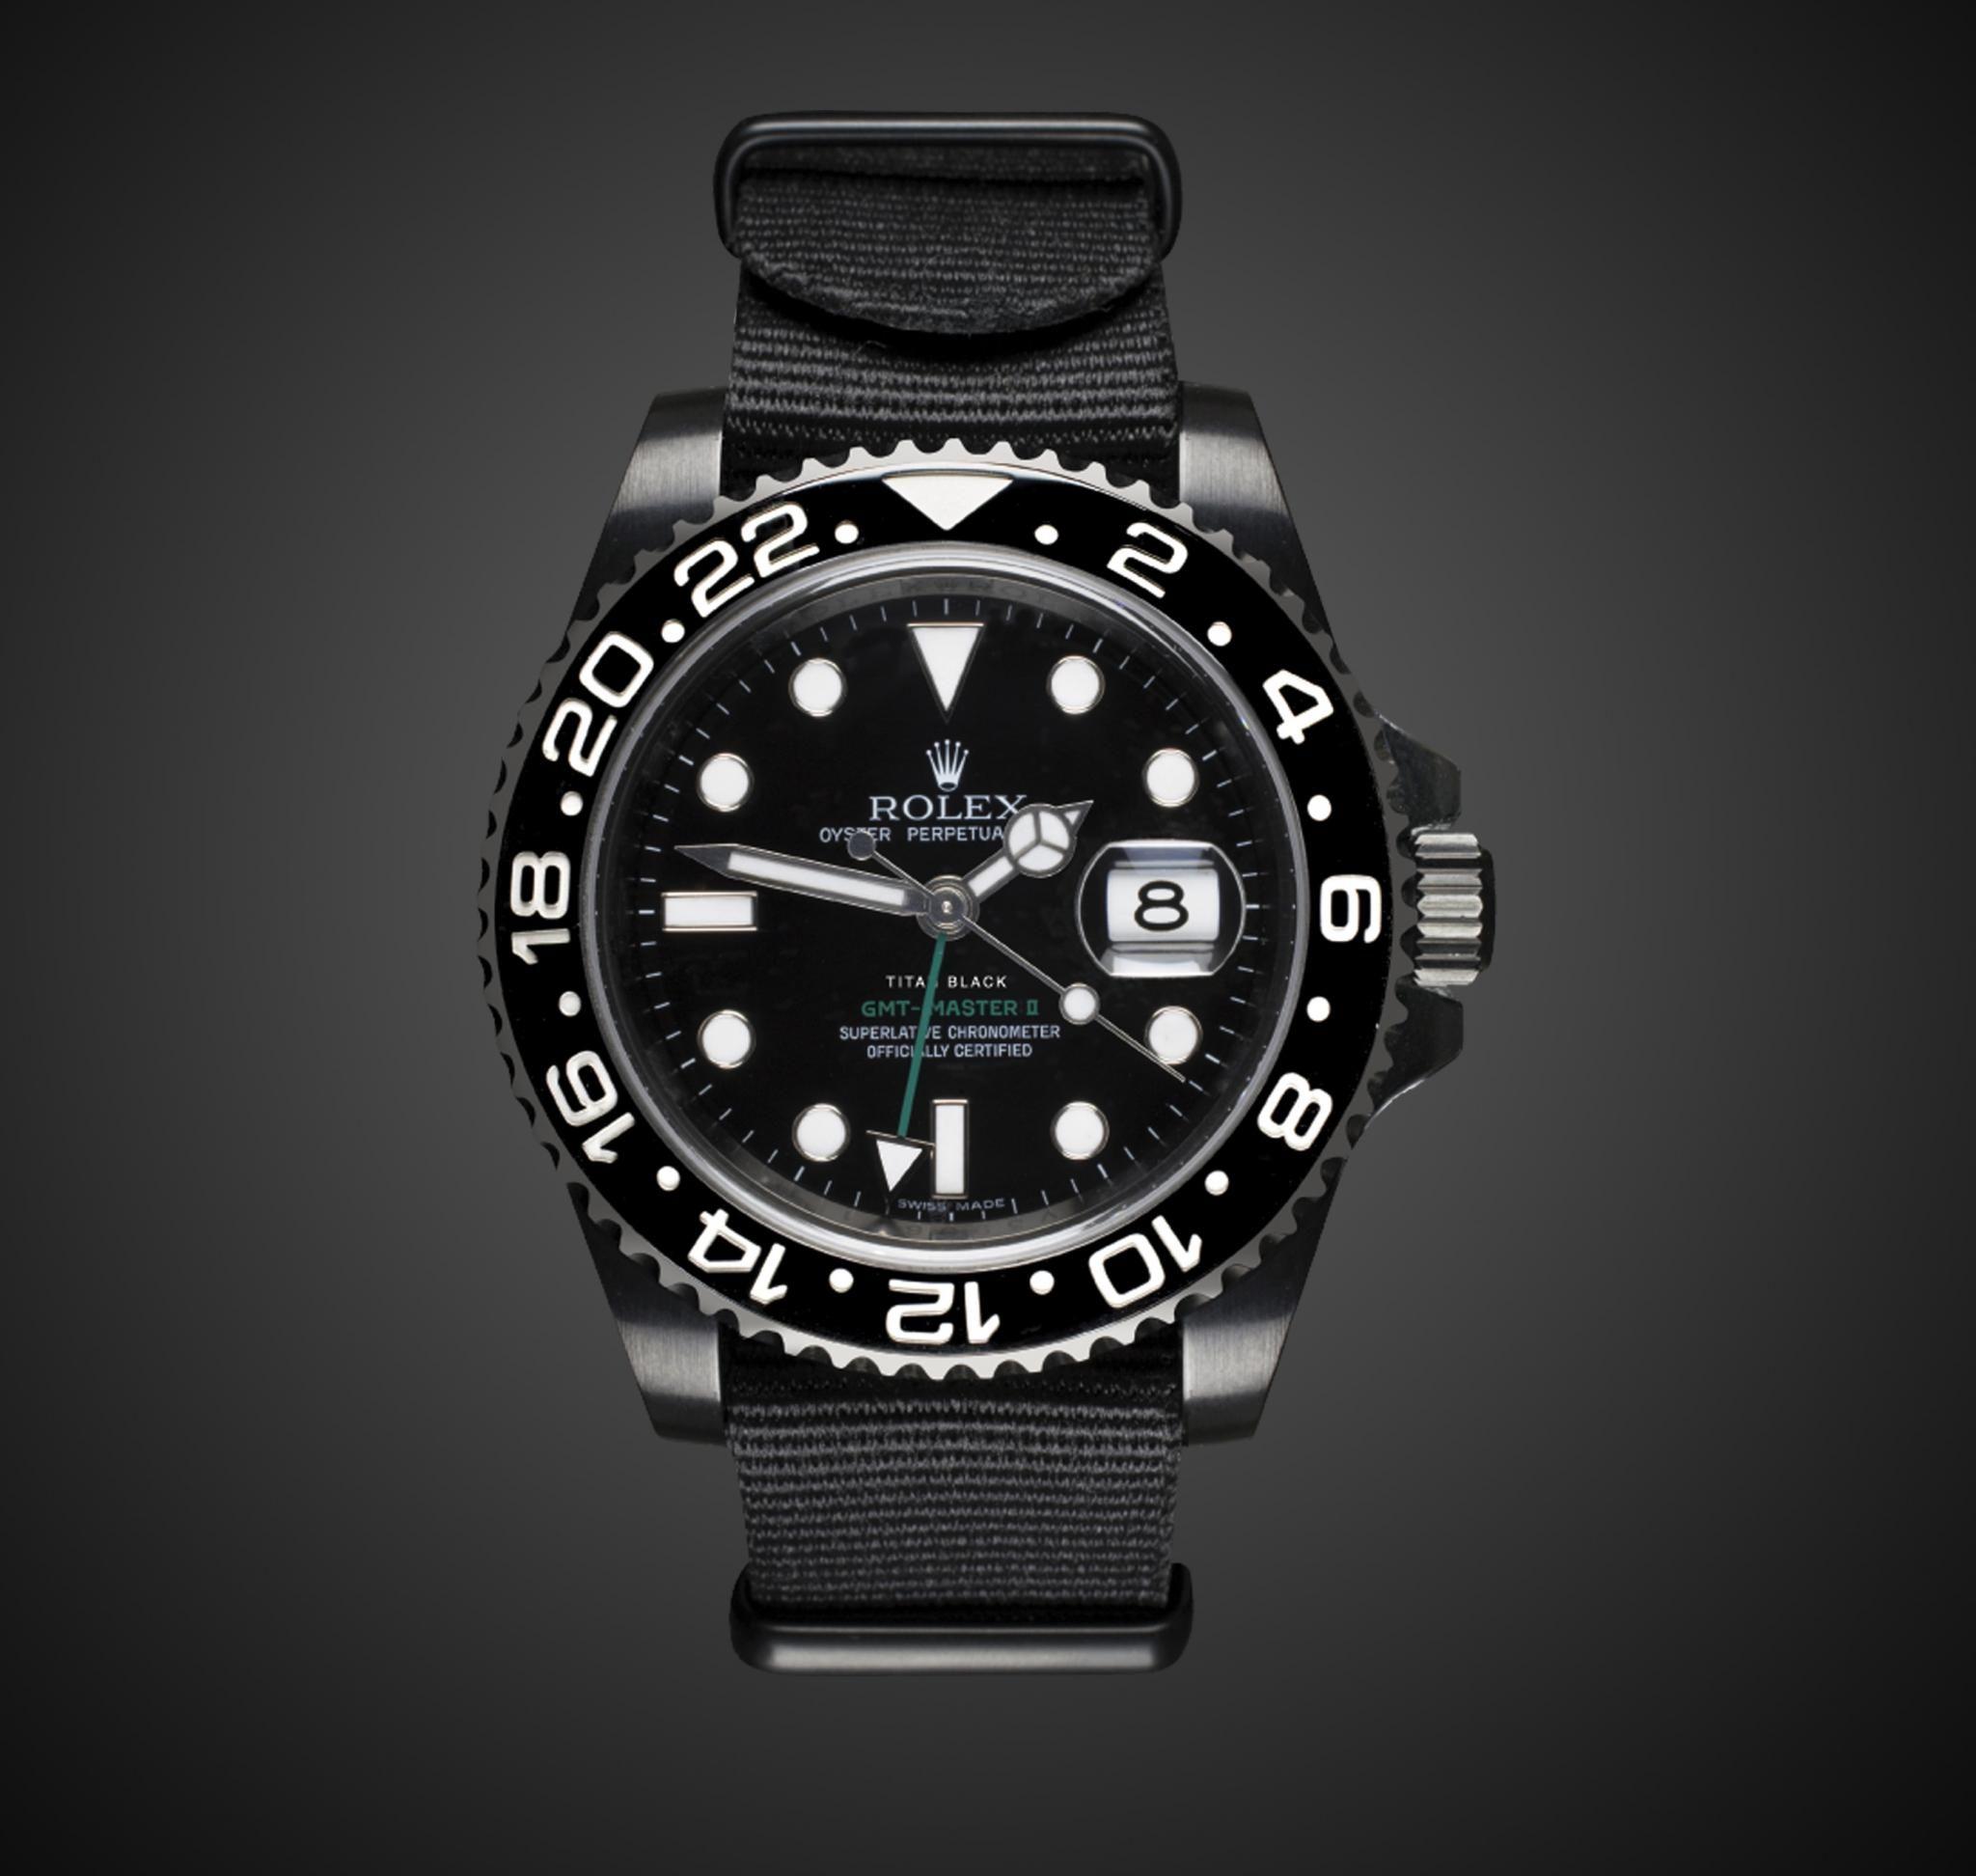 Rolex Pvd Black